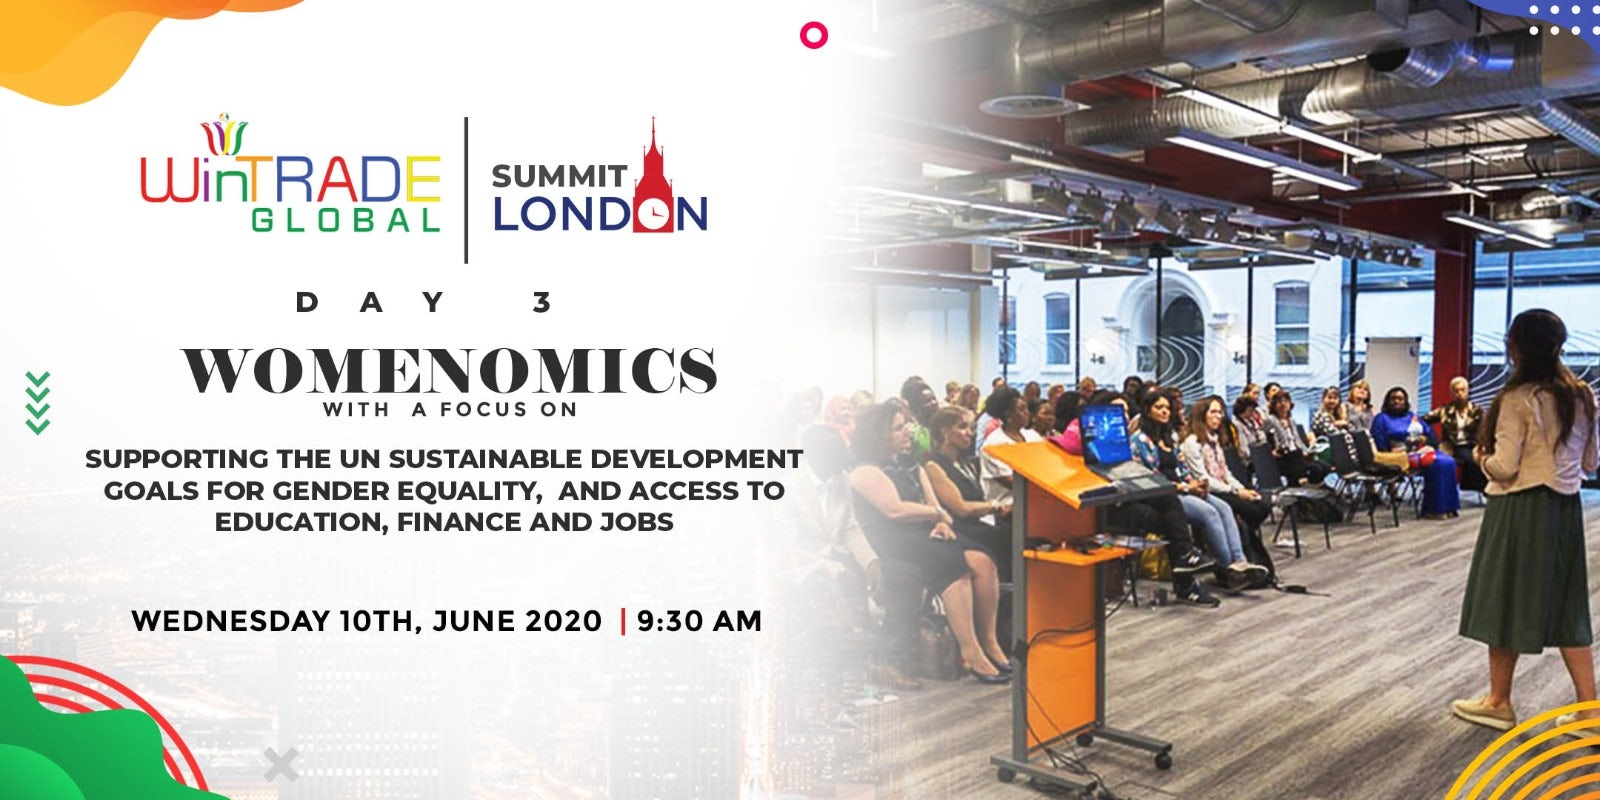 WinTrade Global Wednesday June 2020